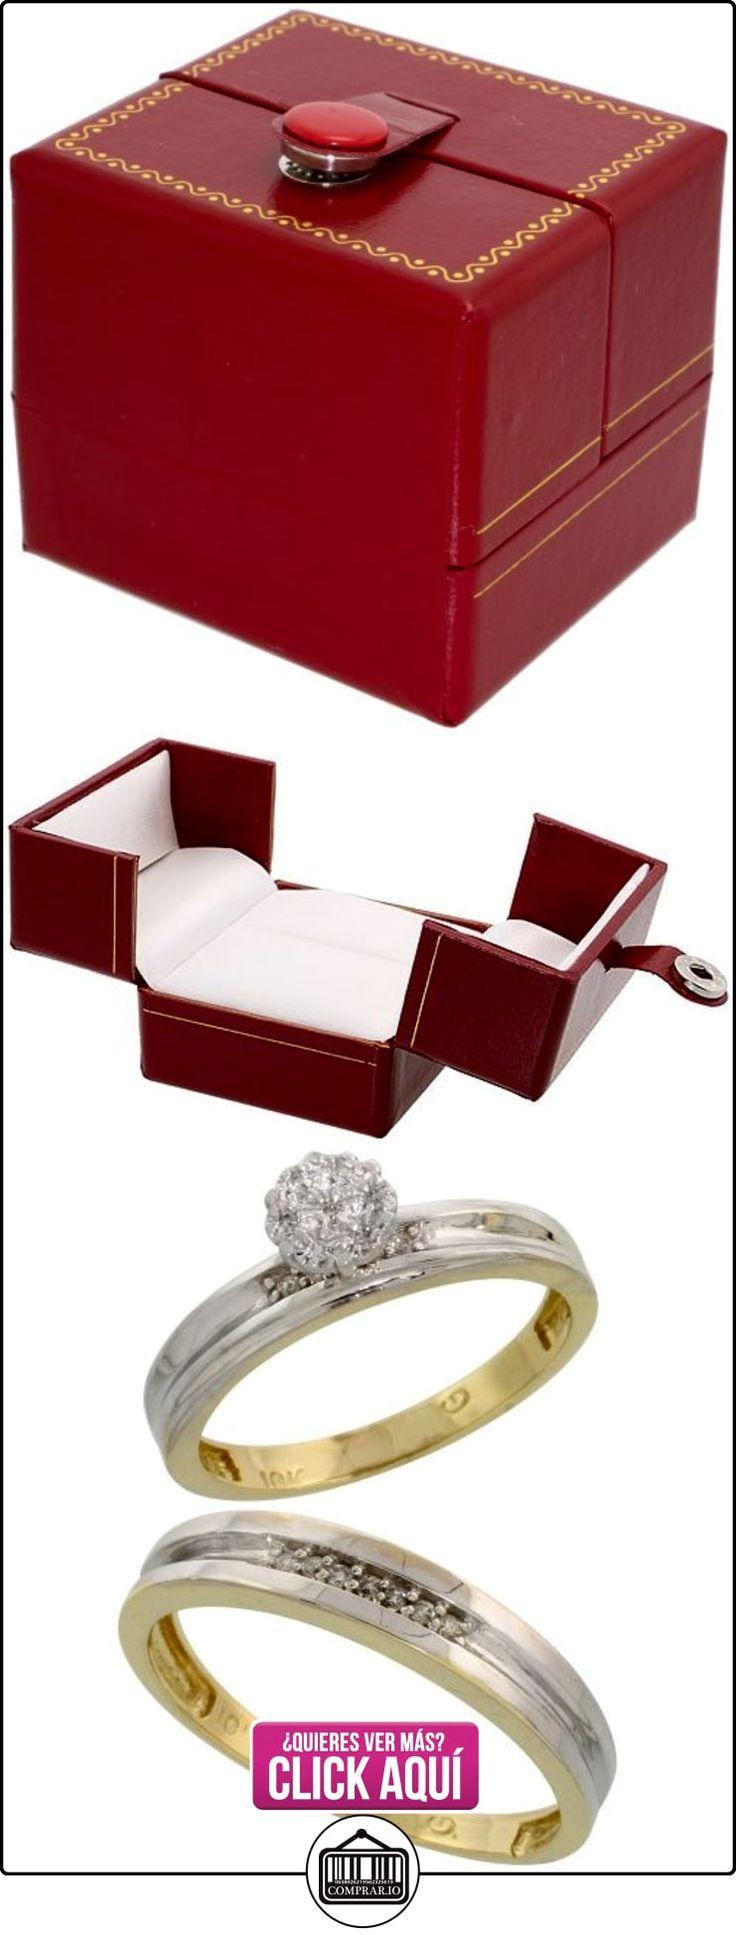 Revoni - Anillo de compromiso de oro amarillo  ✿ Joyas para hombres especiales - lujo ✿ ▬► Ver oferta: http://comprar.io/goto/B005M3FH4E